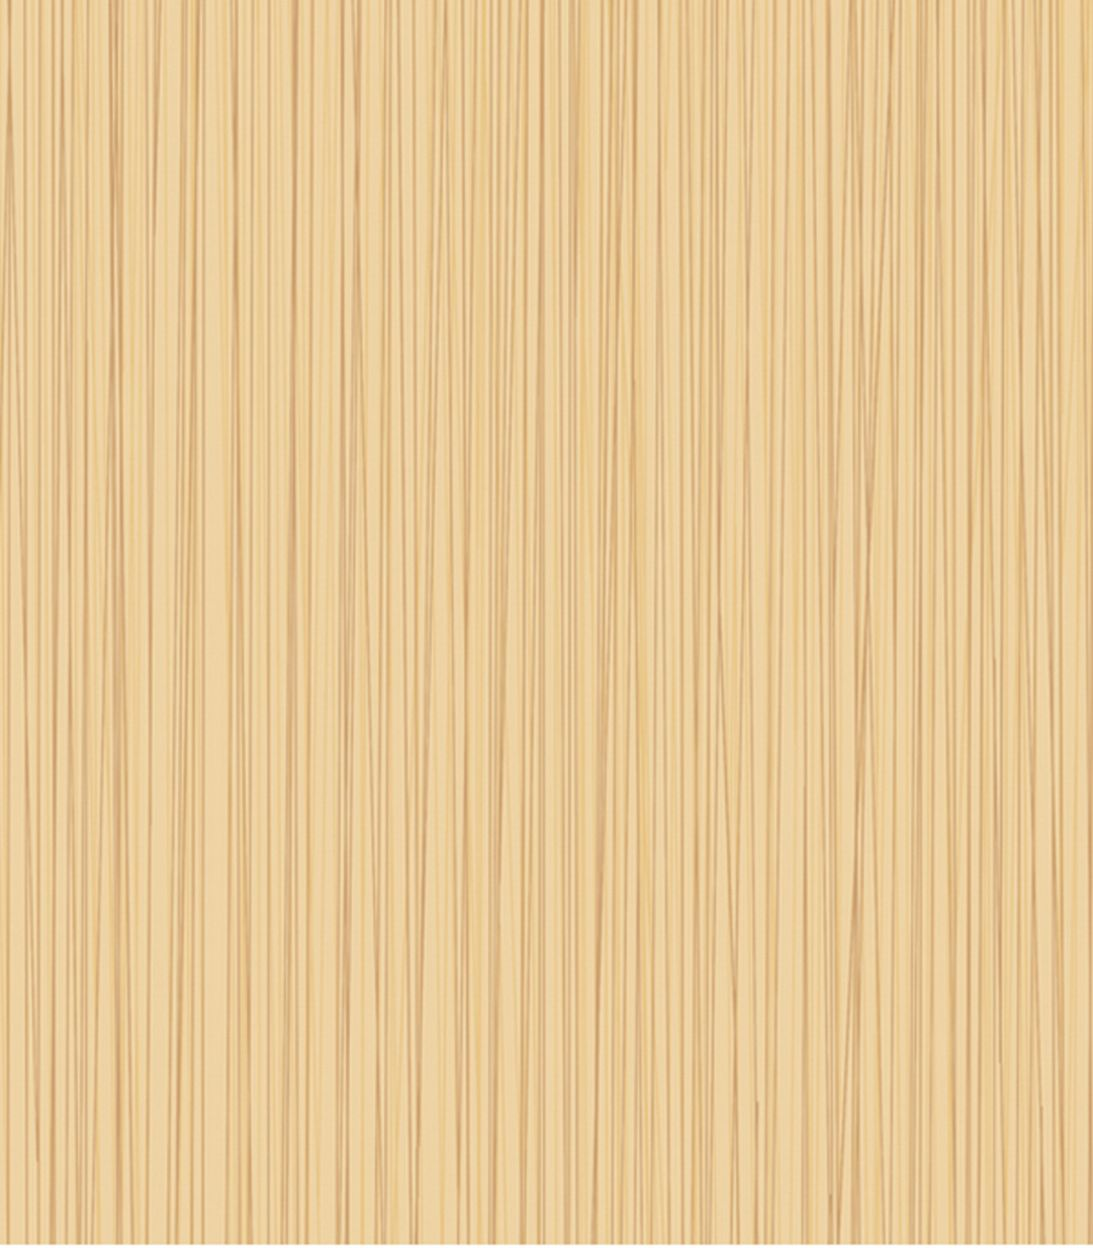 Плитка облицовочная Cersanit Light бежевая 200x300x7 мм (20 шт.=1,2 кв.м) фото